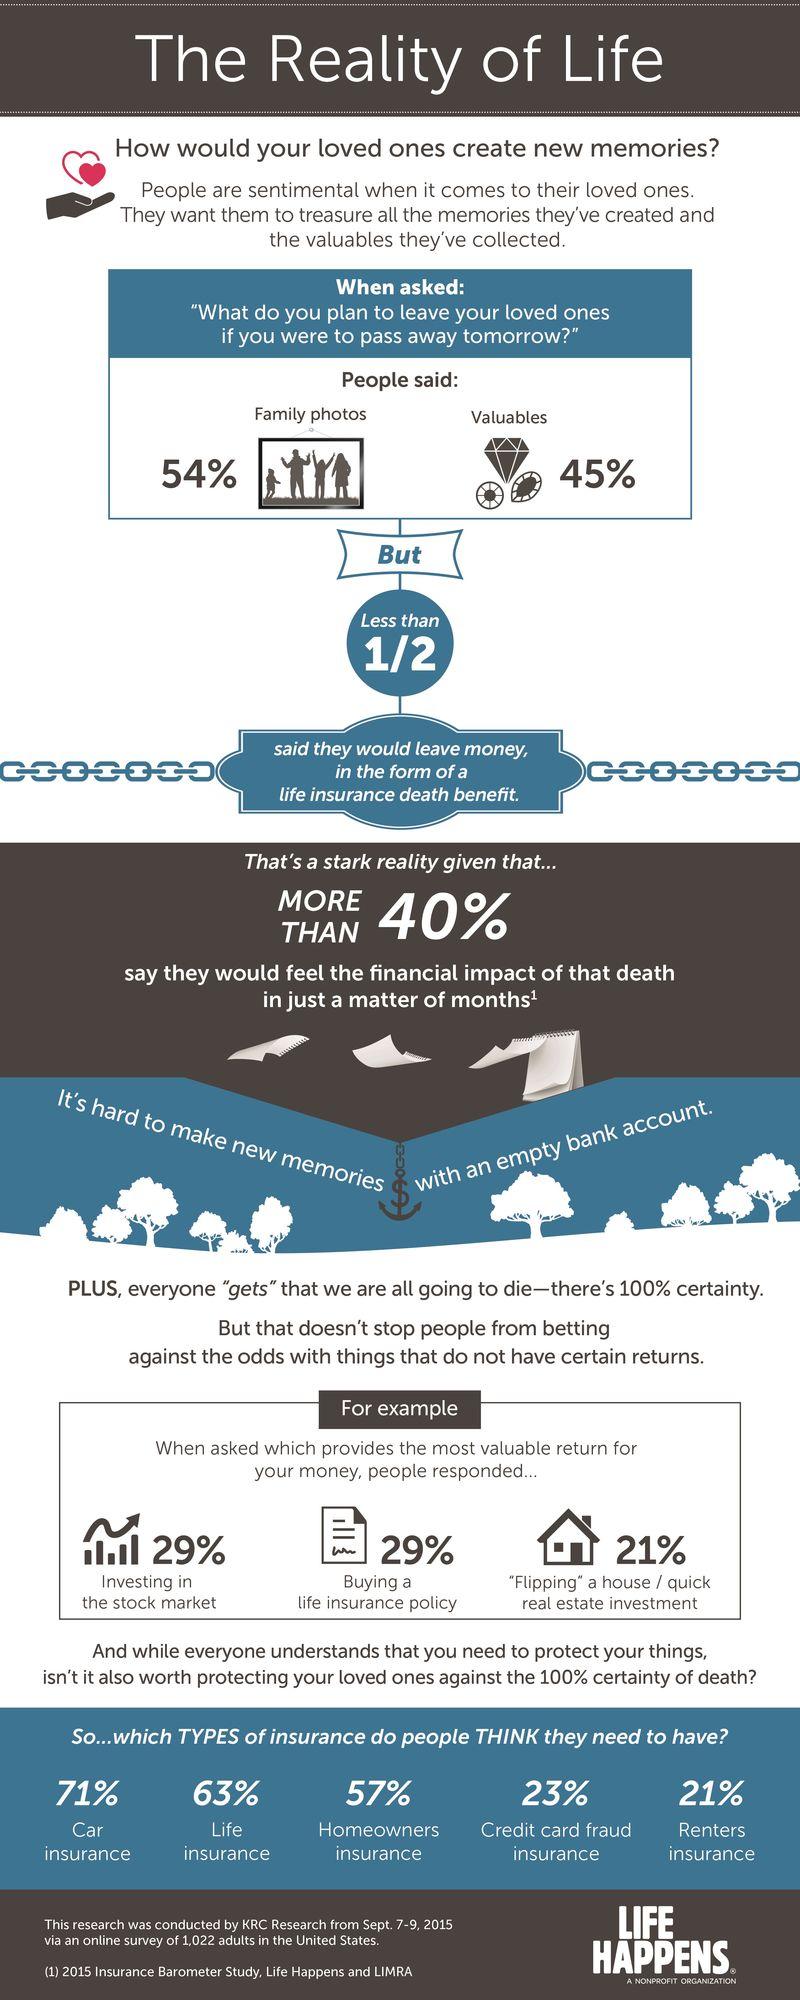 02-08-16-news-infographic-life-happens